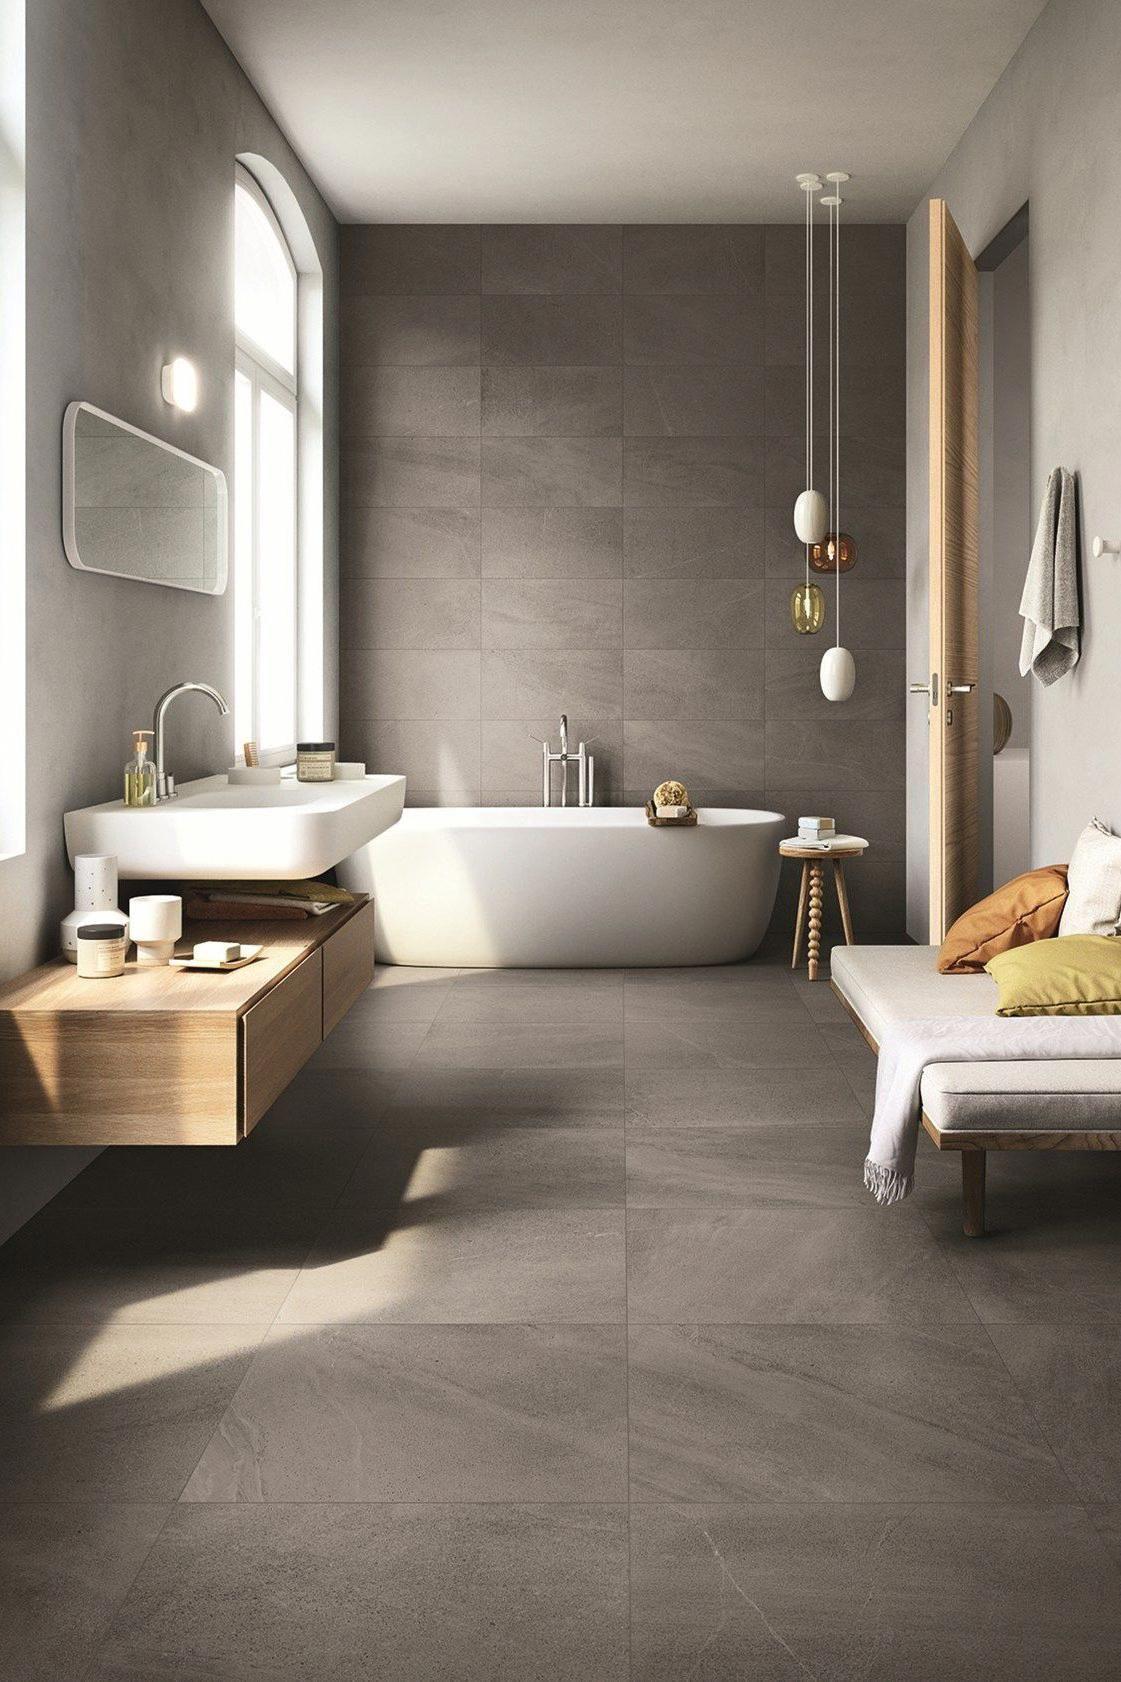 Best Bathroom Designs | Small Restroom Decor | Complete ...